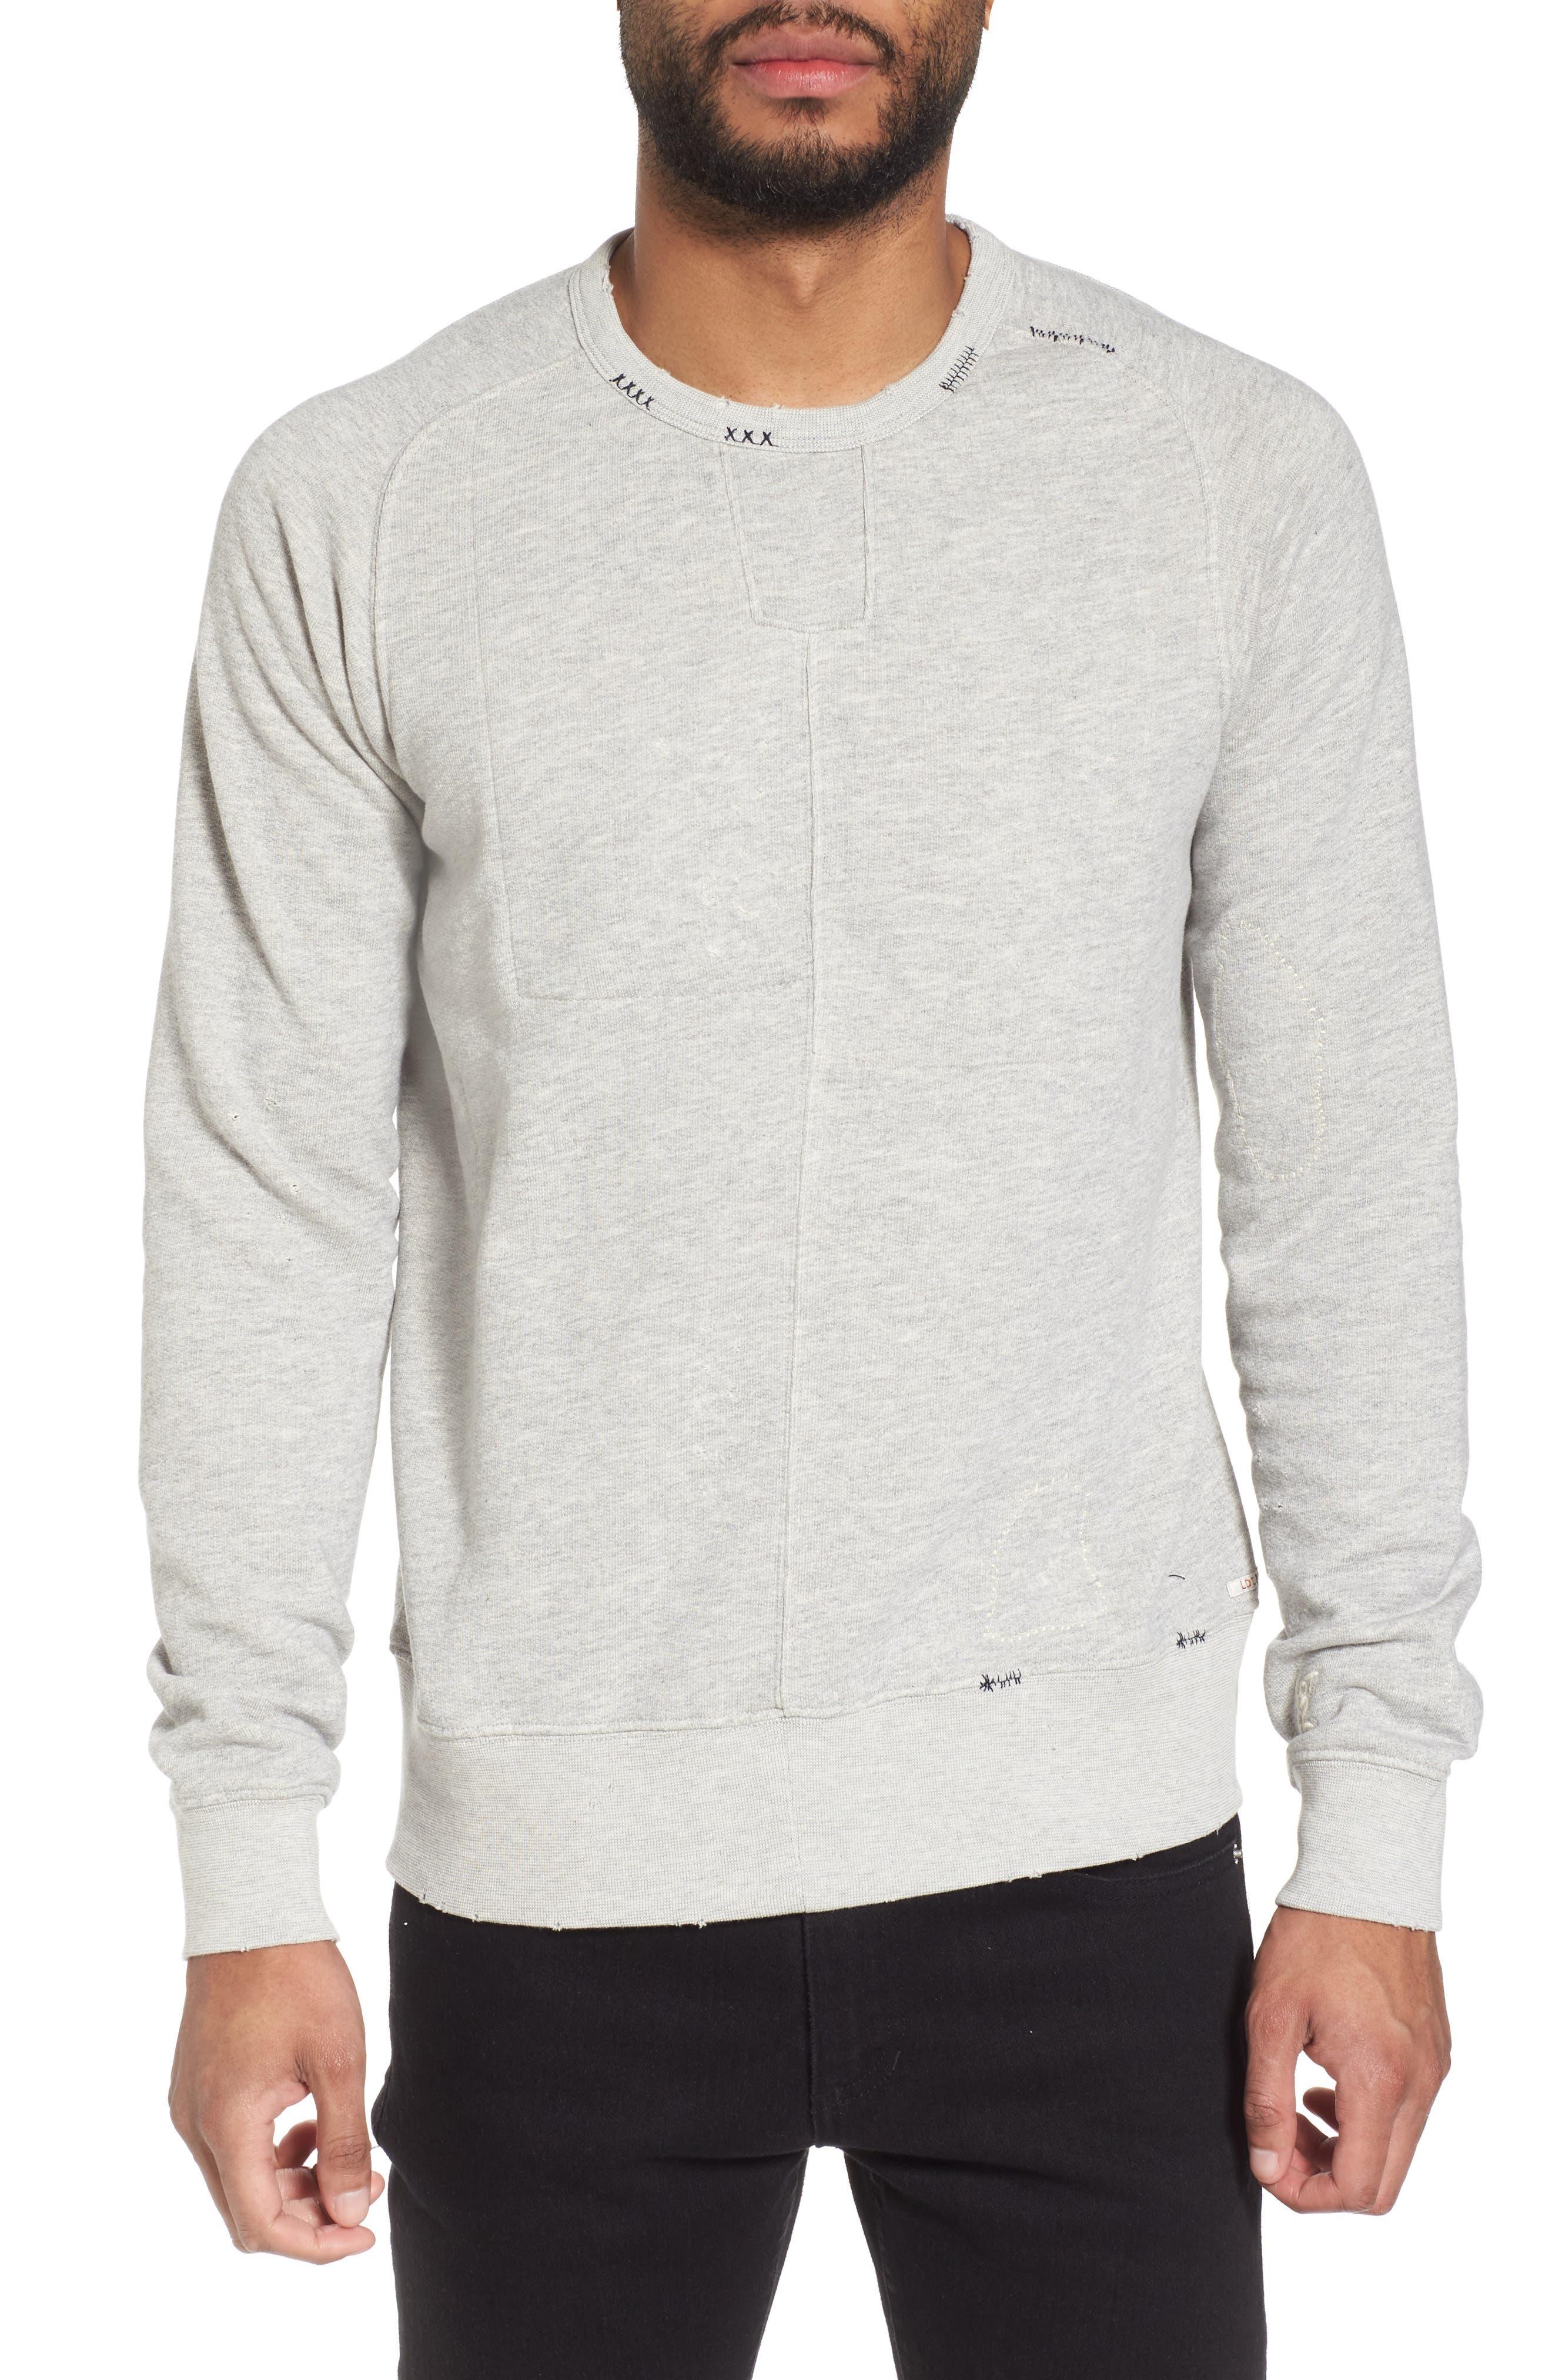 Lot 22 Sweatshirt,                         Main,                         color, Blue